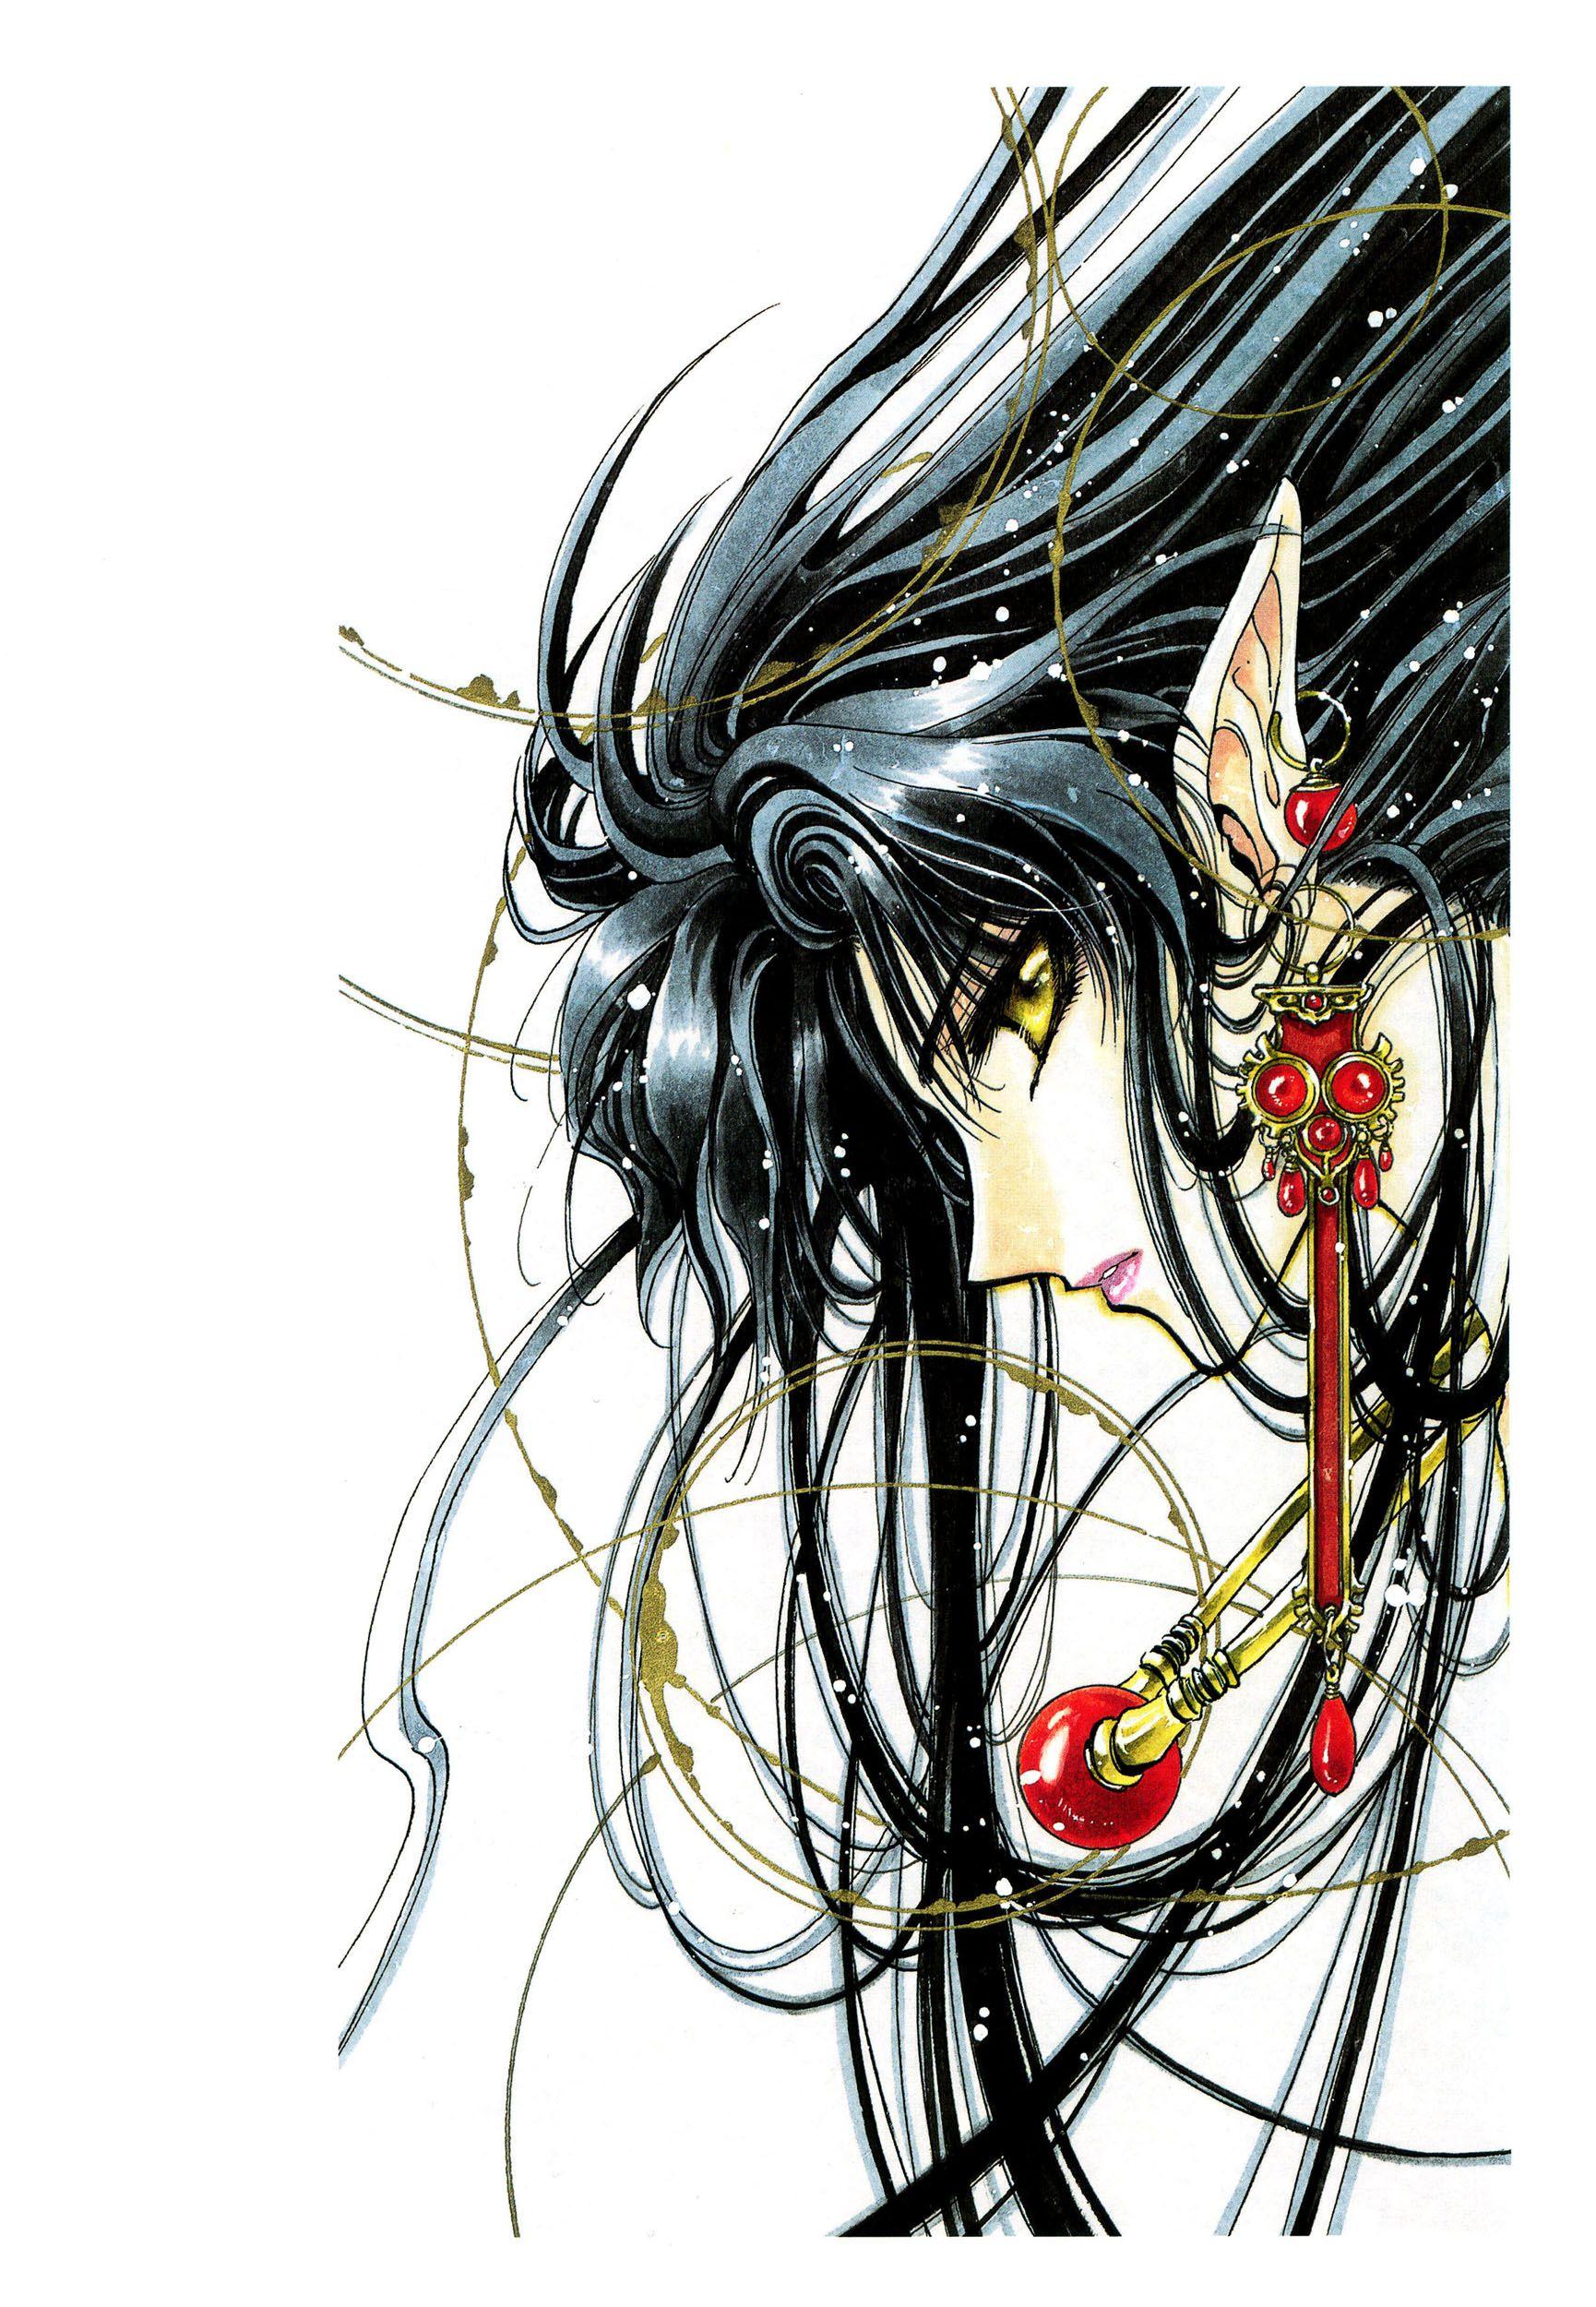 RG Veda Anime, Manga illustration, Rg veda